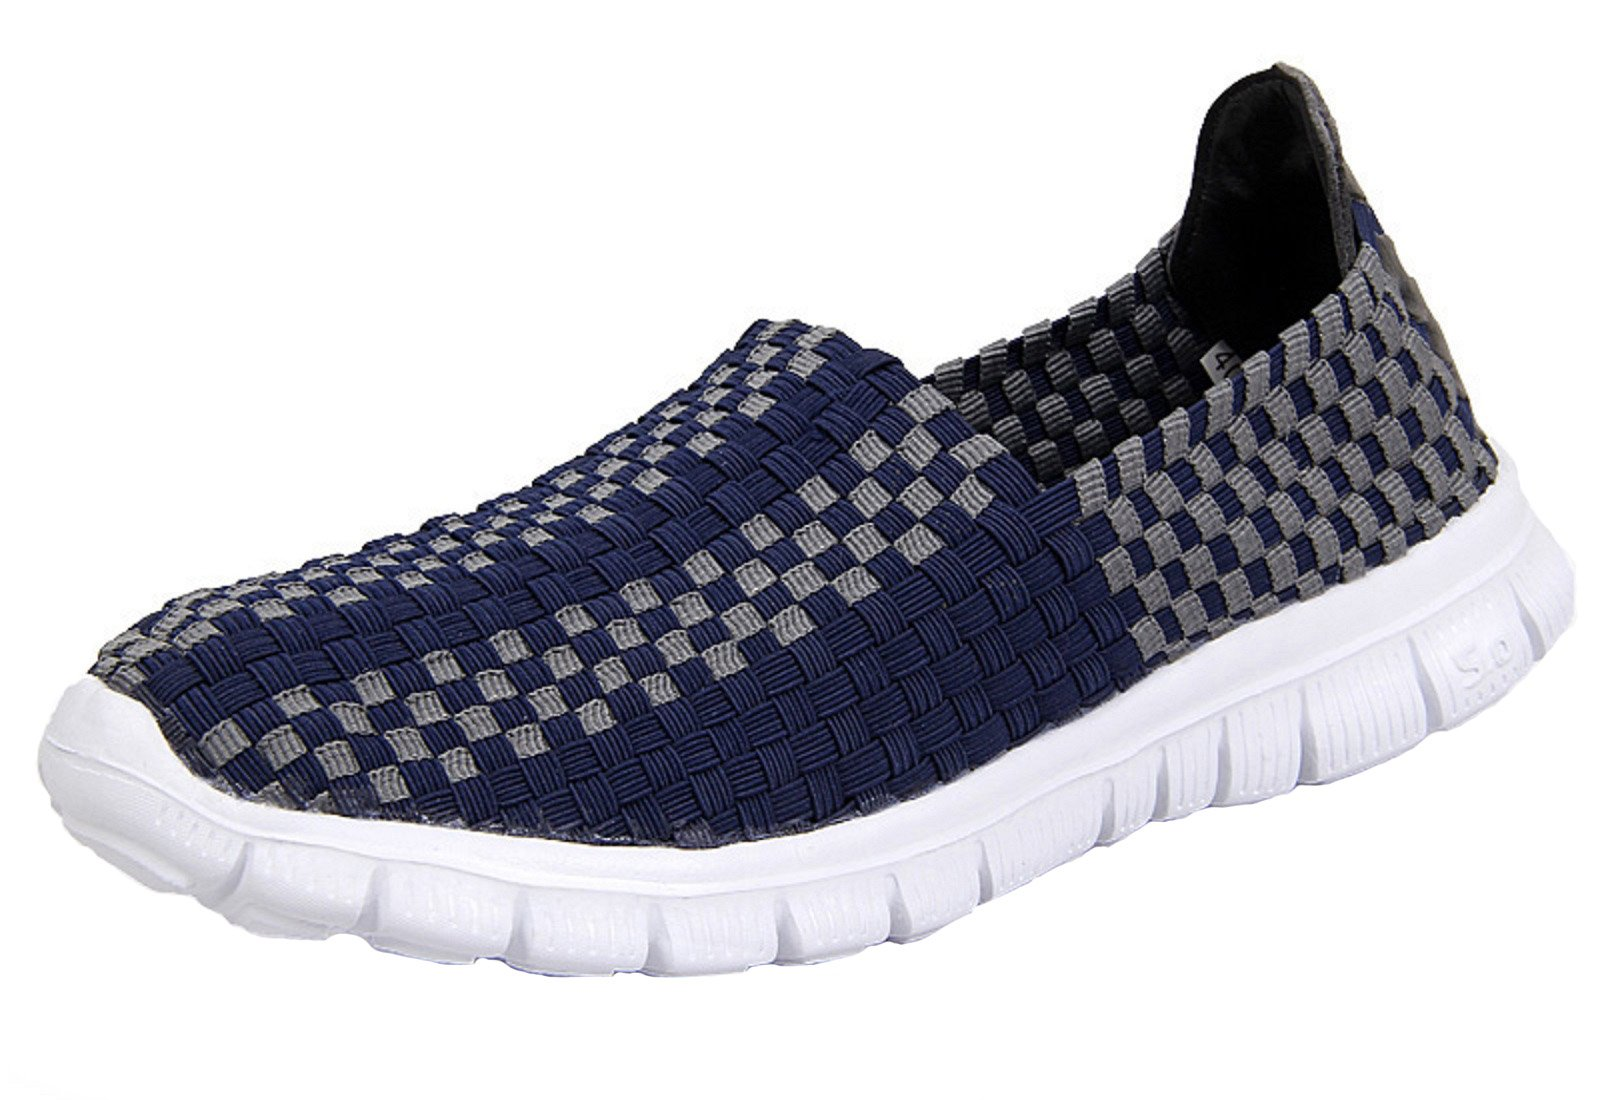 VenusCelia Women's Performance Woven Walking Sneakers Shoes (6.5 B(M) US,Navy/Gray)